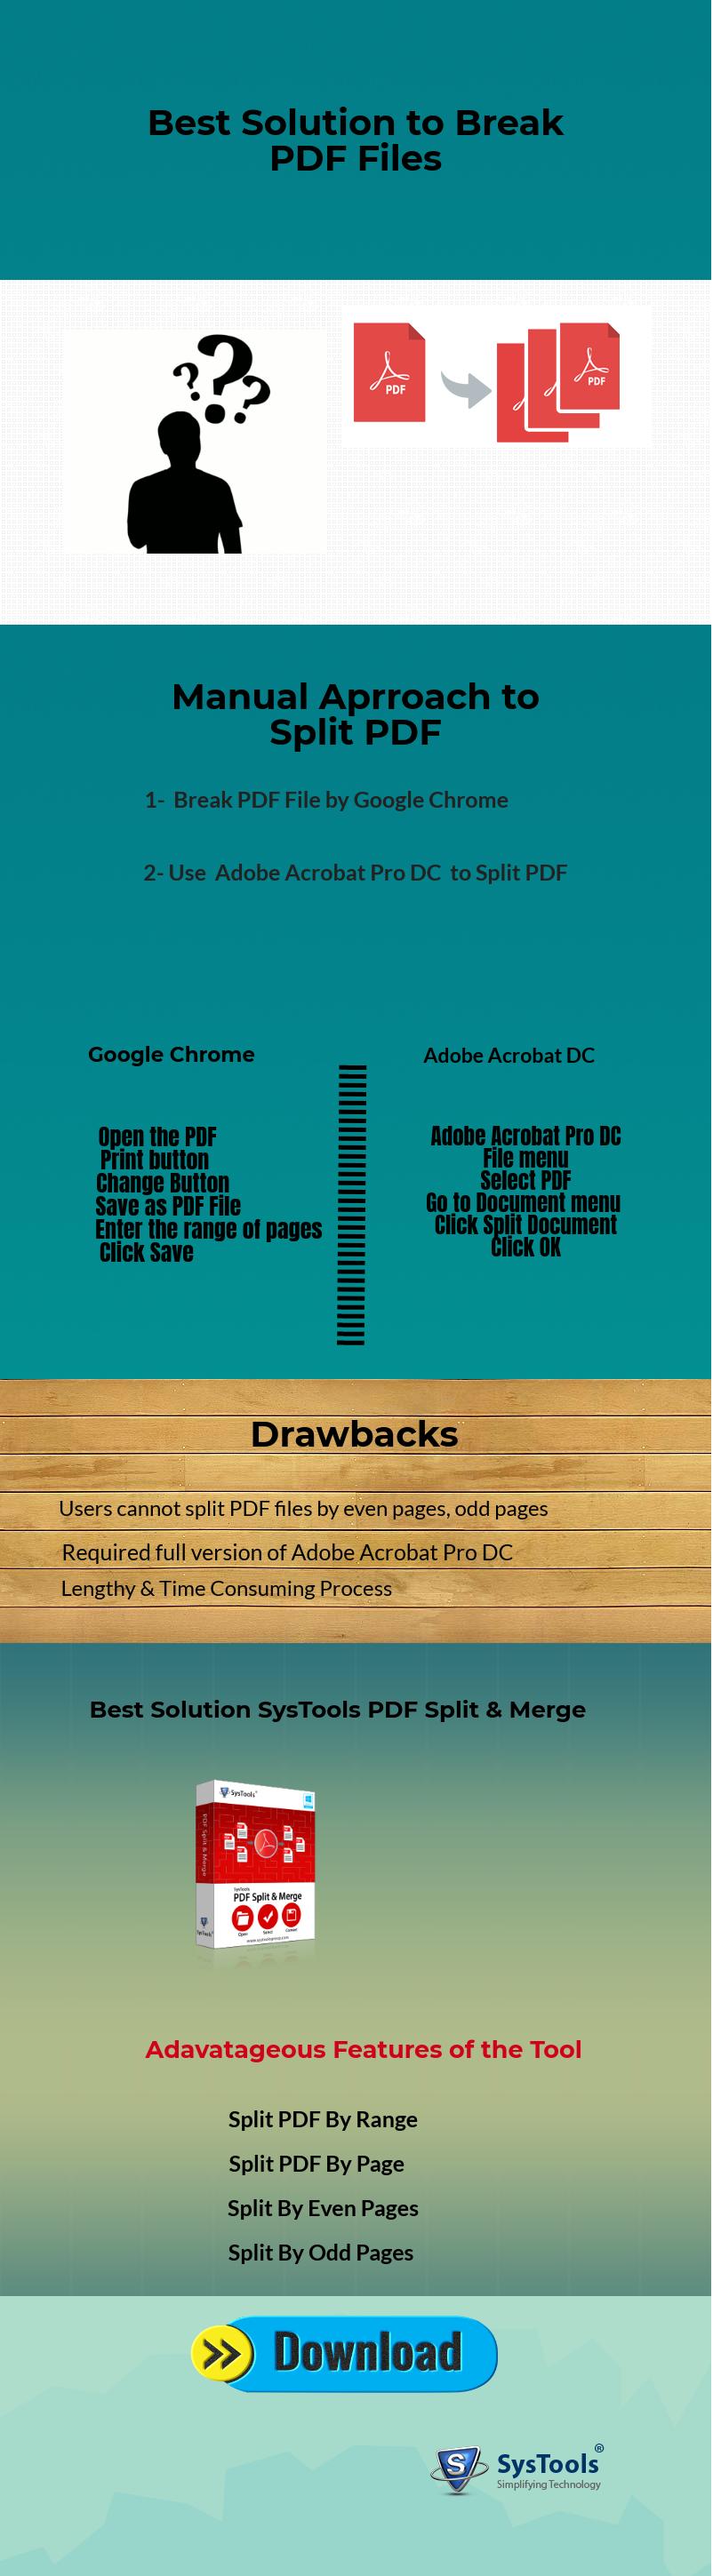 Learn Multiple Techniques to Break PDF File into Smaller Parts